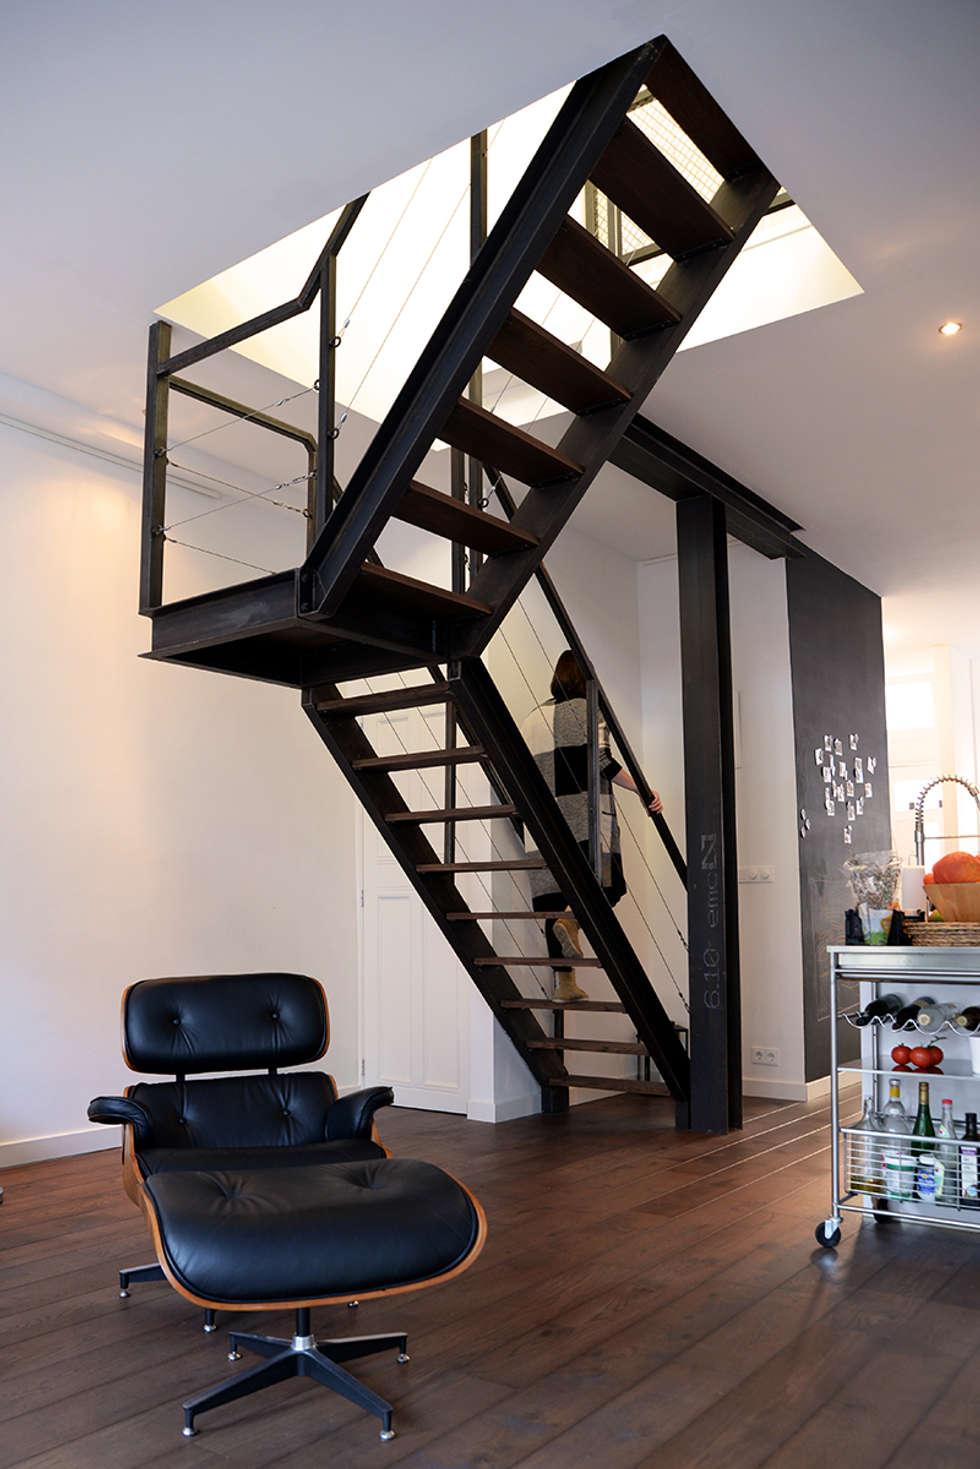 Voordelen trap in woonkamer 28 images voordelen trap Trap in woonkamer